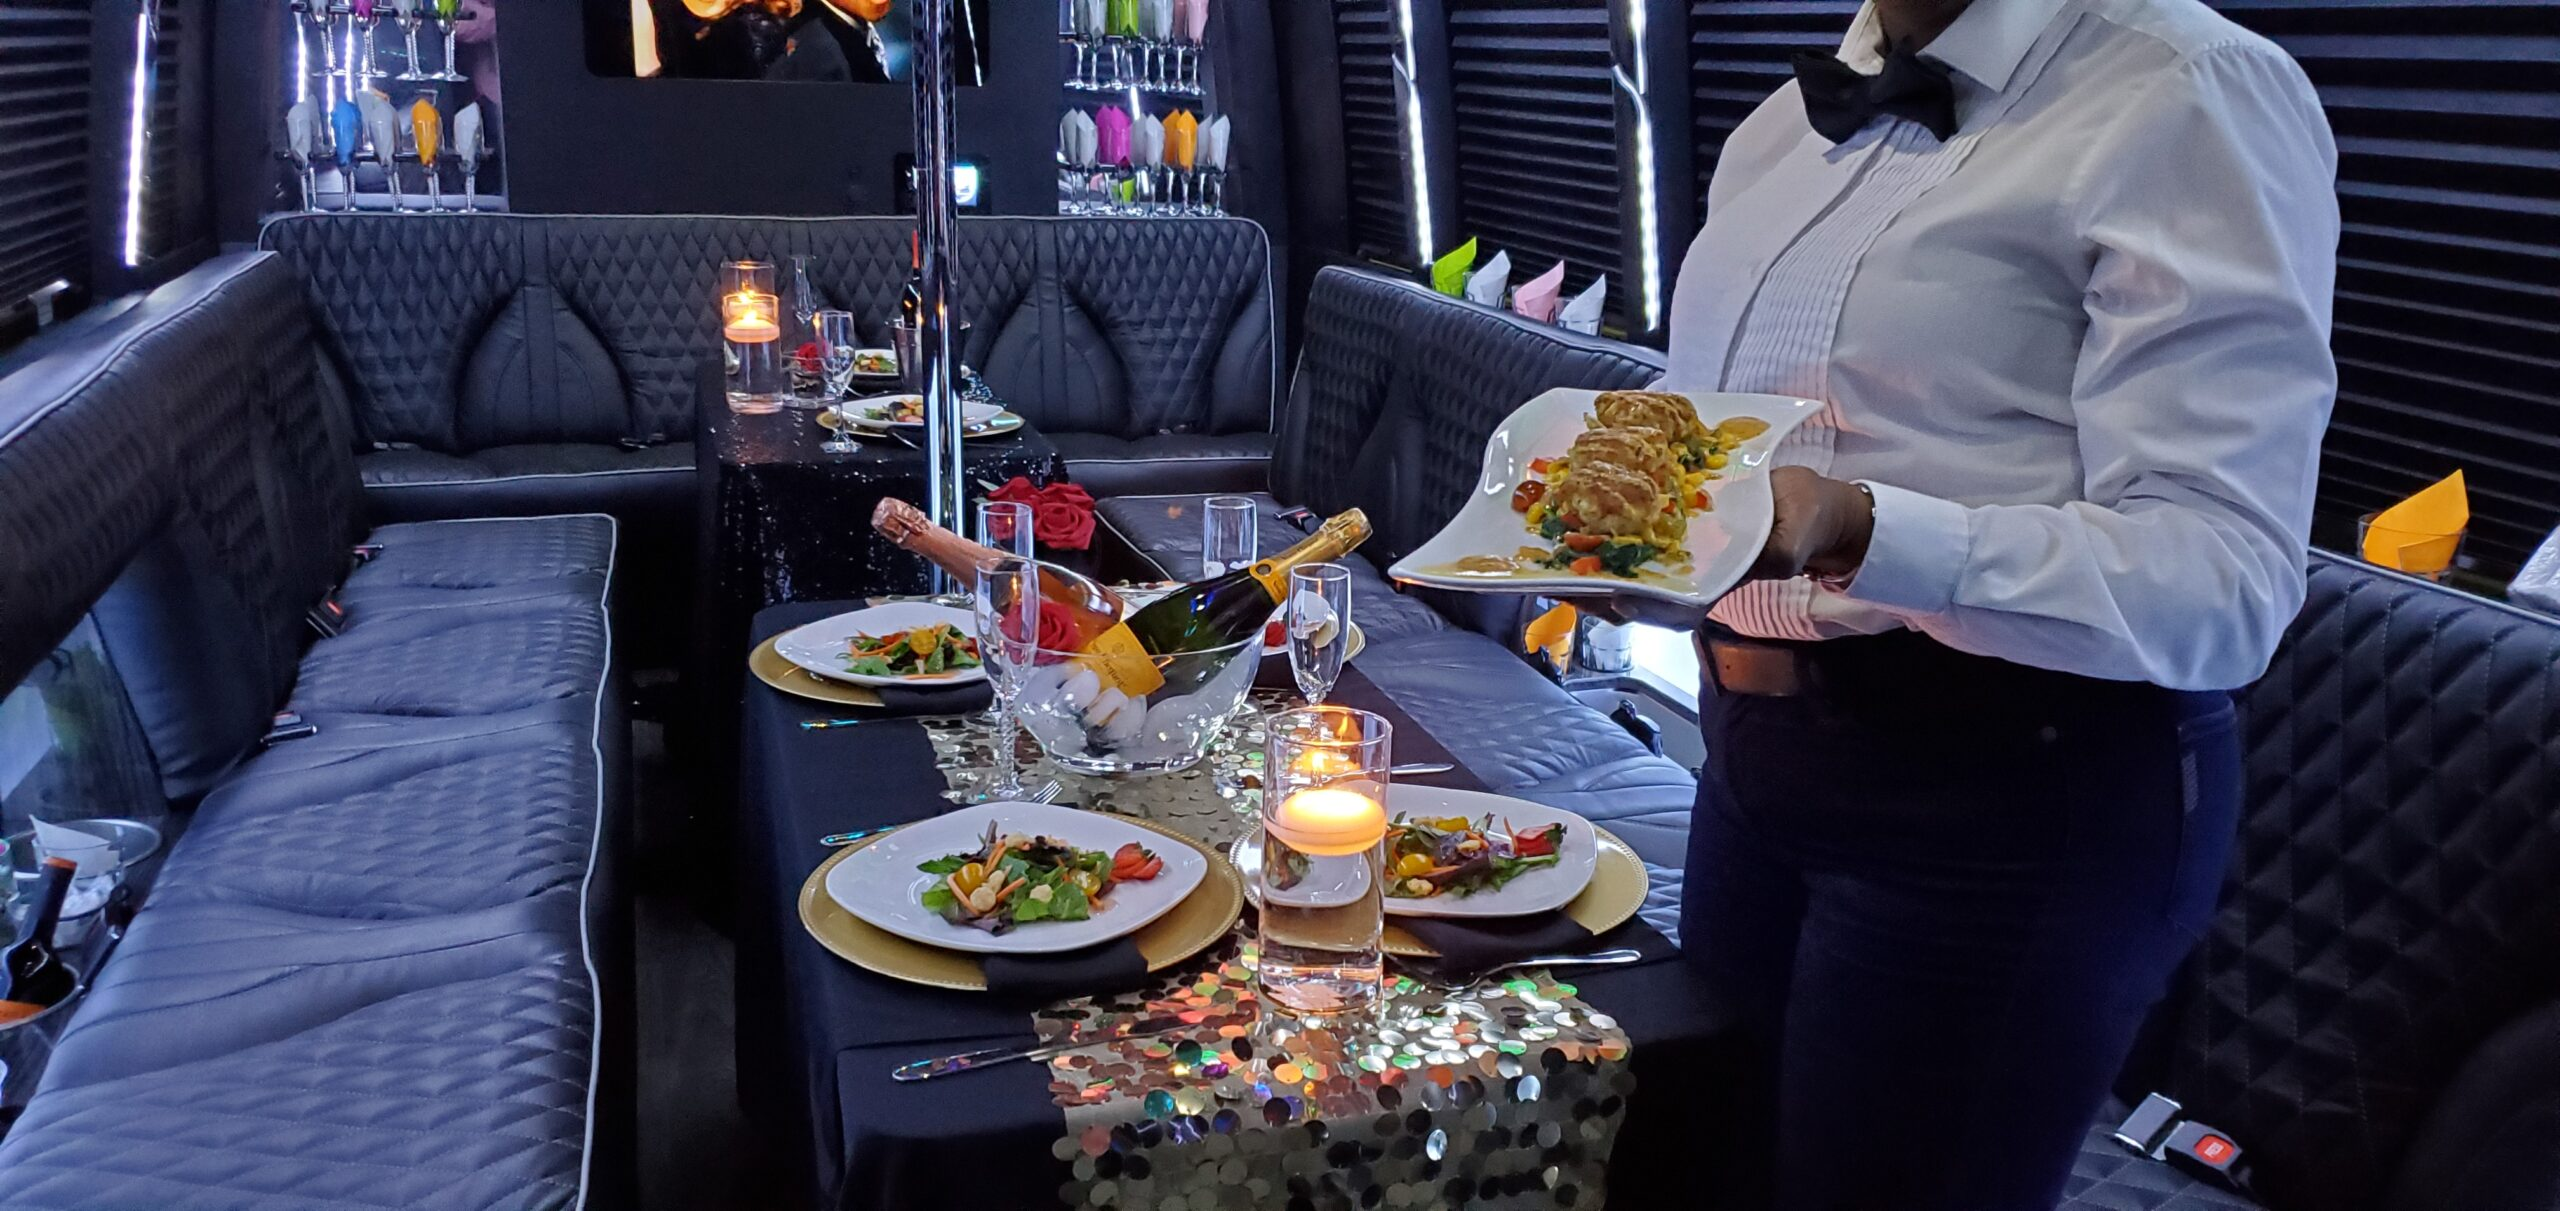 Dicko Transportation 24 Passenger Party Bus Dinner service